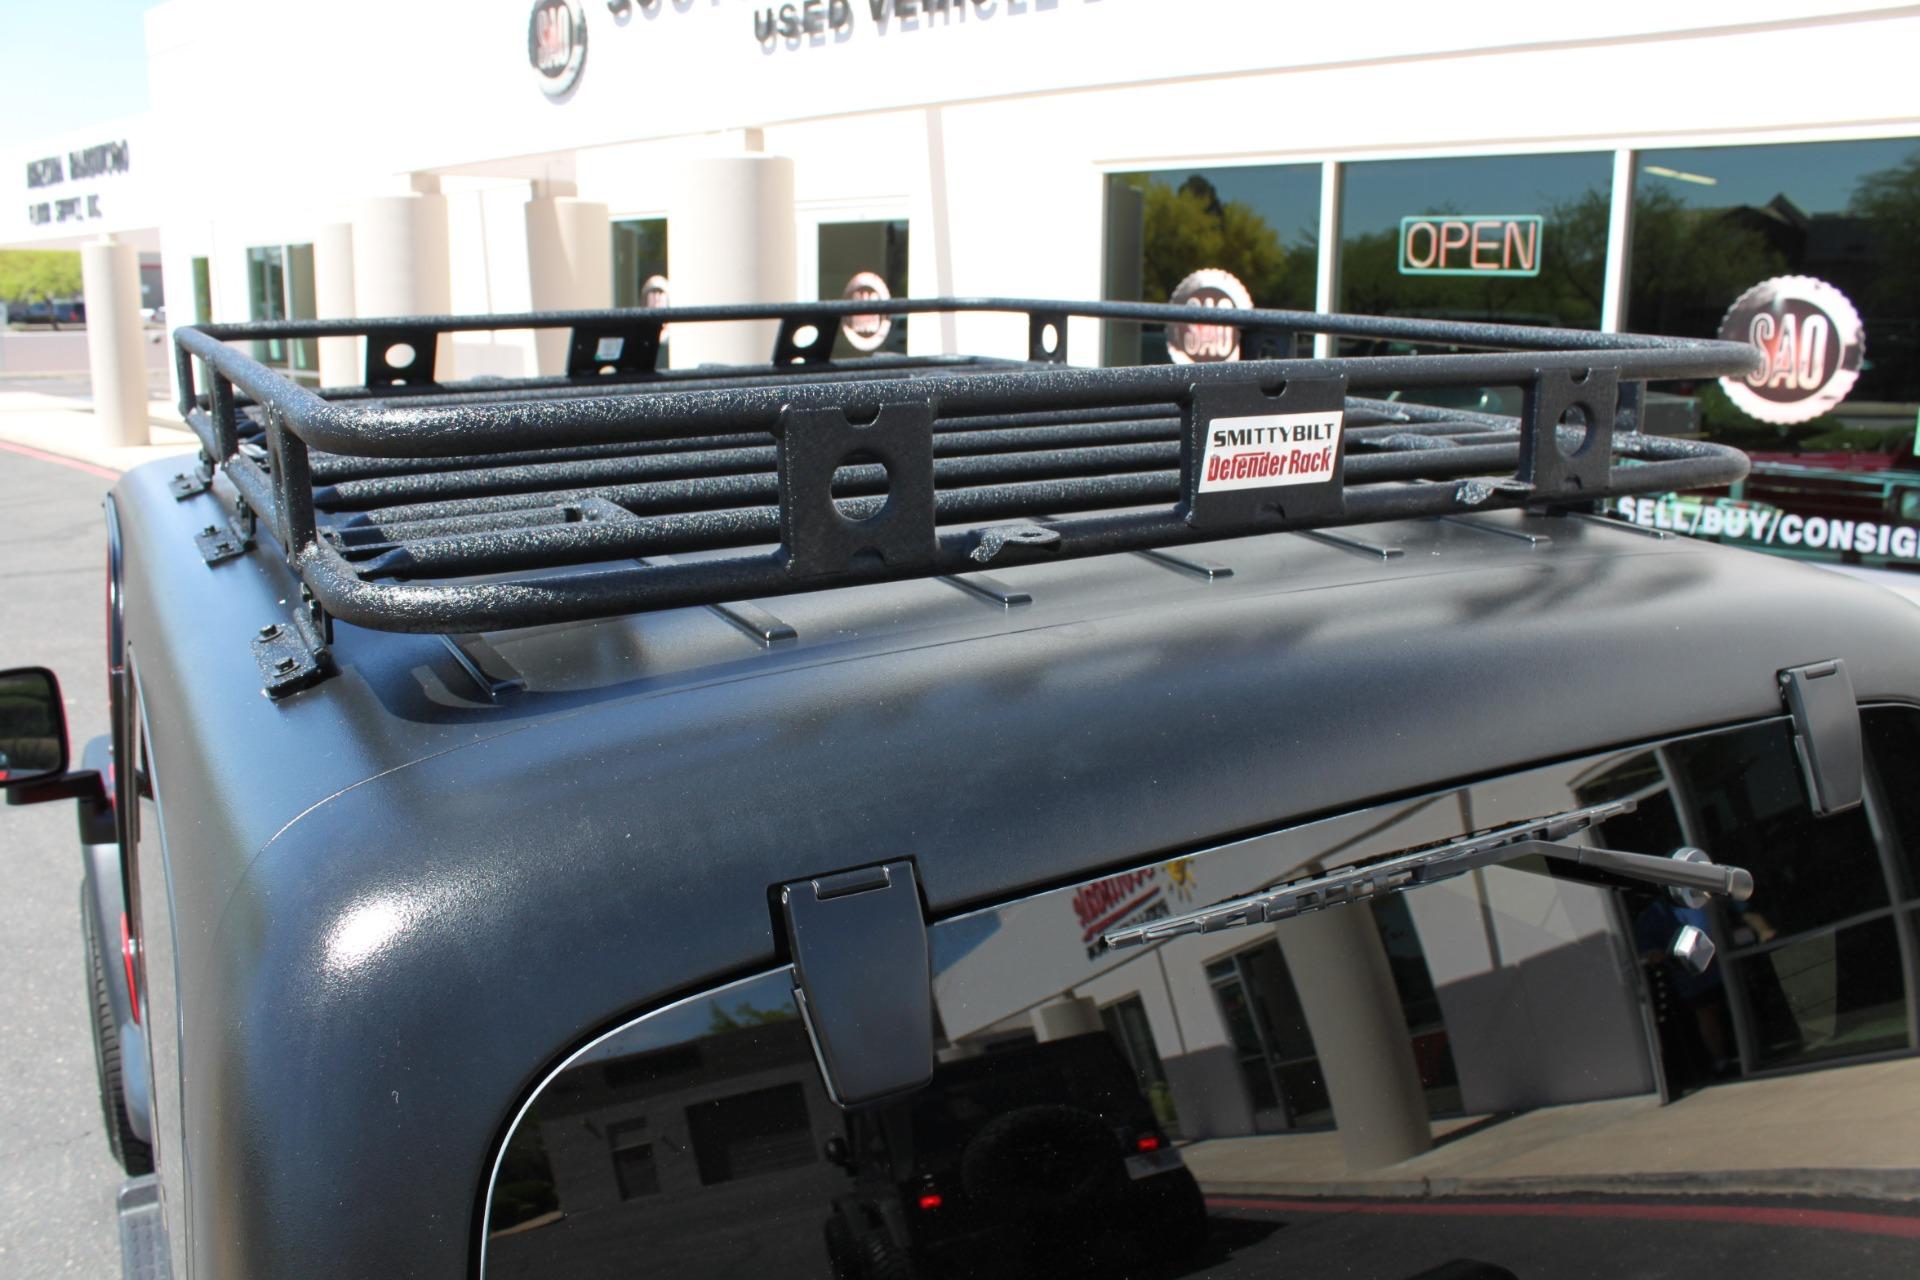 Used-2006-Jeep-Wrangler-4X4-LJ-Unlimited-LWB-Honda